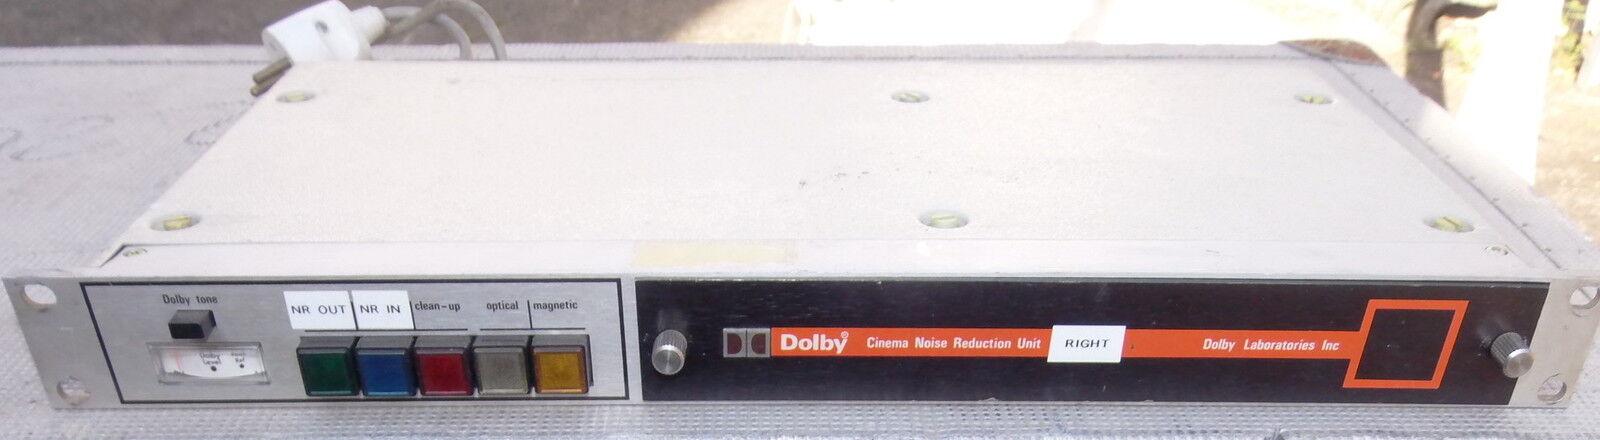 1 DOLBY 364 CINEMA NOISE REDUCTION UNIT  + CARD CAT N 22  SUPER VINTAGE